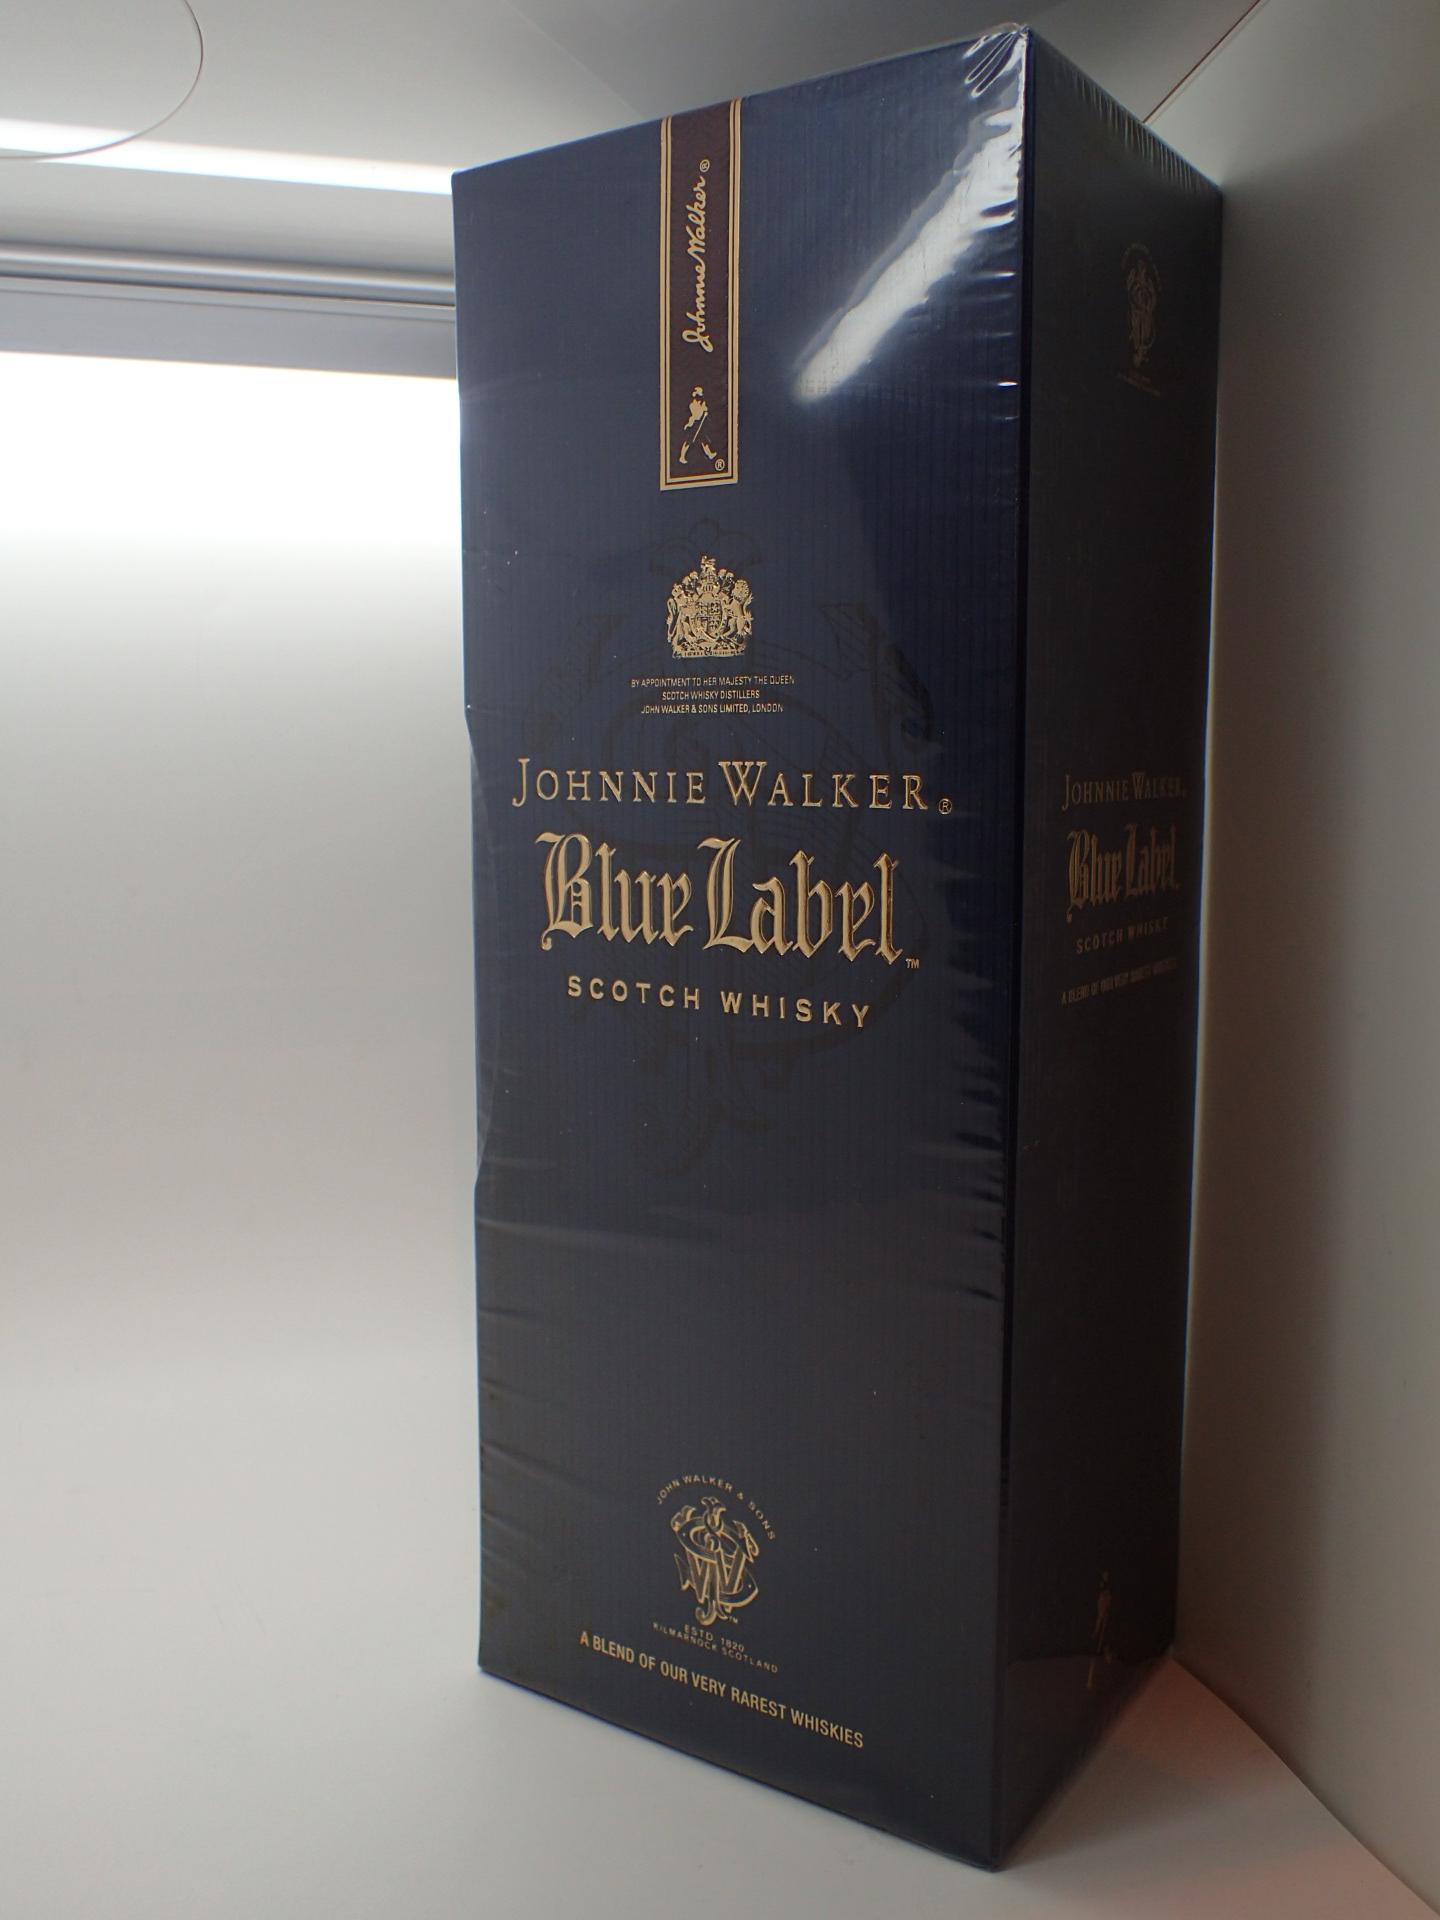 Lot 506 - Johnnie Walker Blue Label scotch whisky